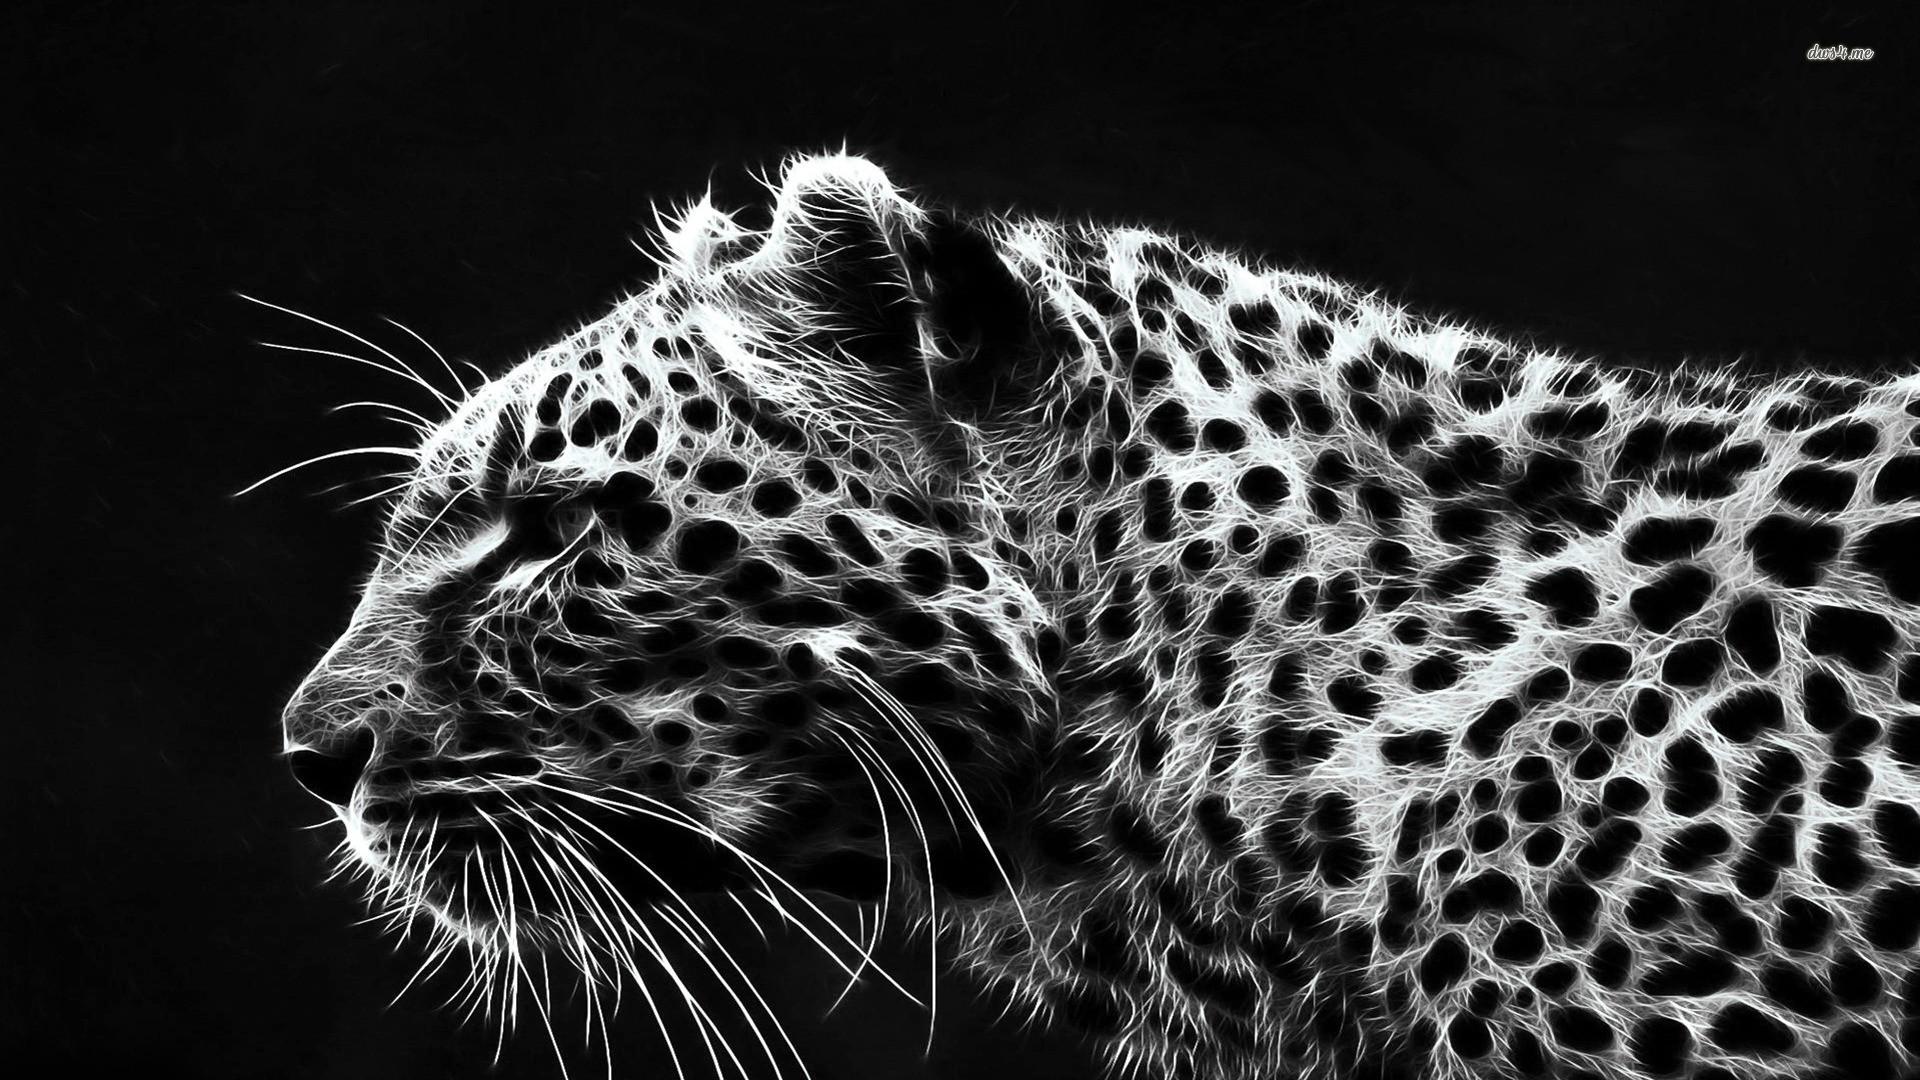 Animais Guepardo Predator (Animal) Animais Big Cat Papel de Parede    Wallpapers Full HD   Pinterest   Wallpaper